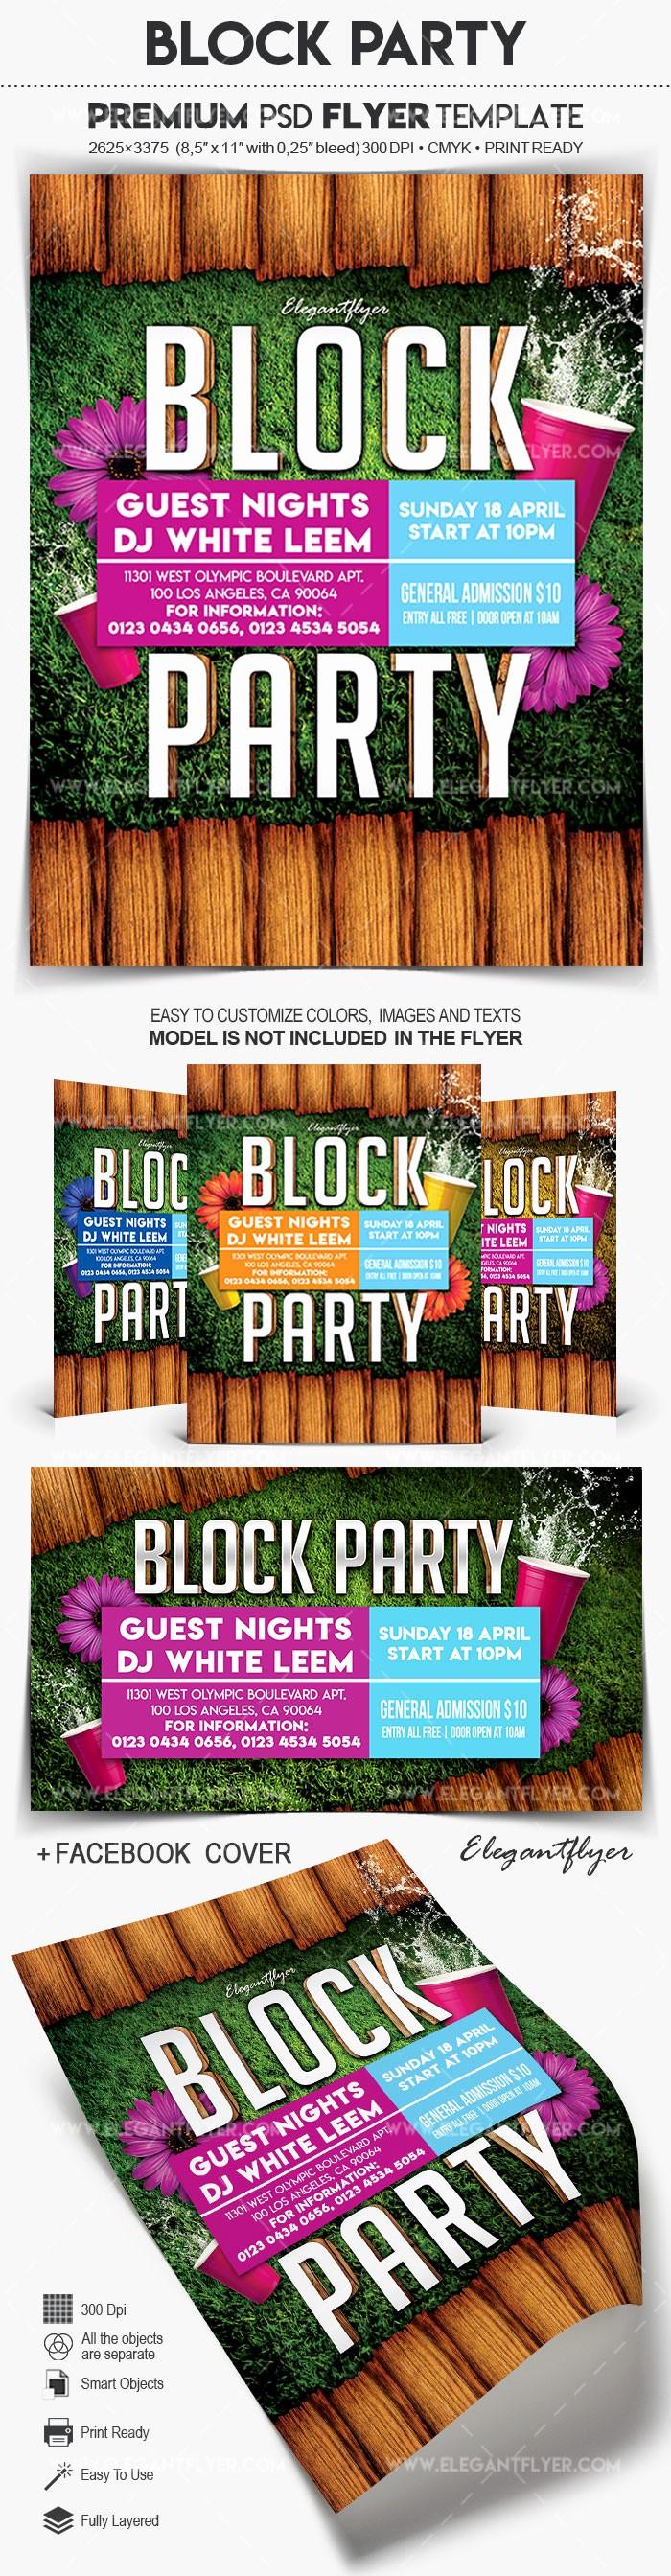 Block Party Flyer Templates Free Fresh Block Party – Flyer Psd Template – by Elegantflyer